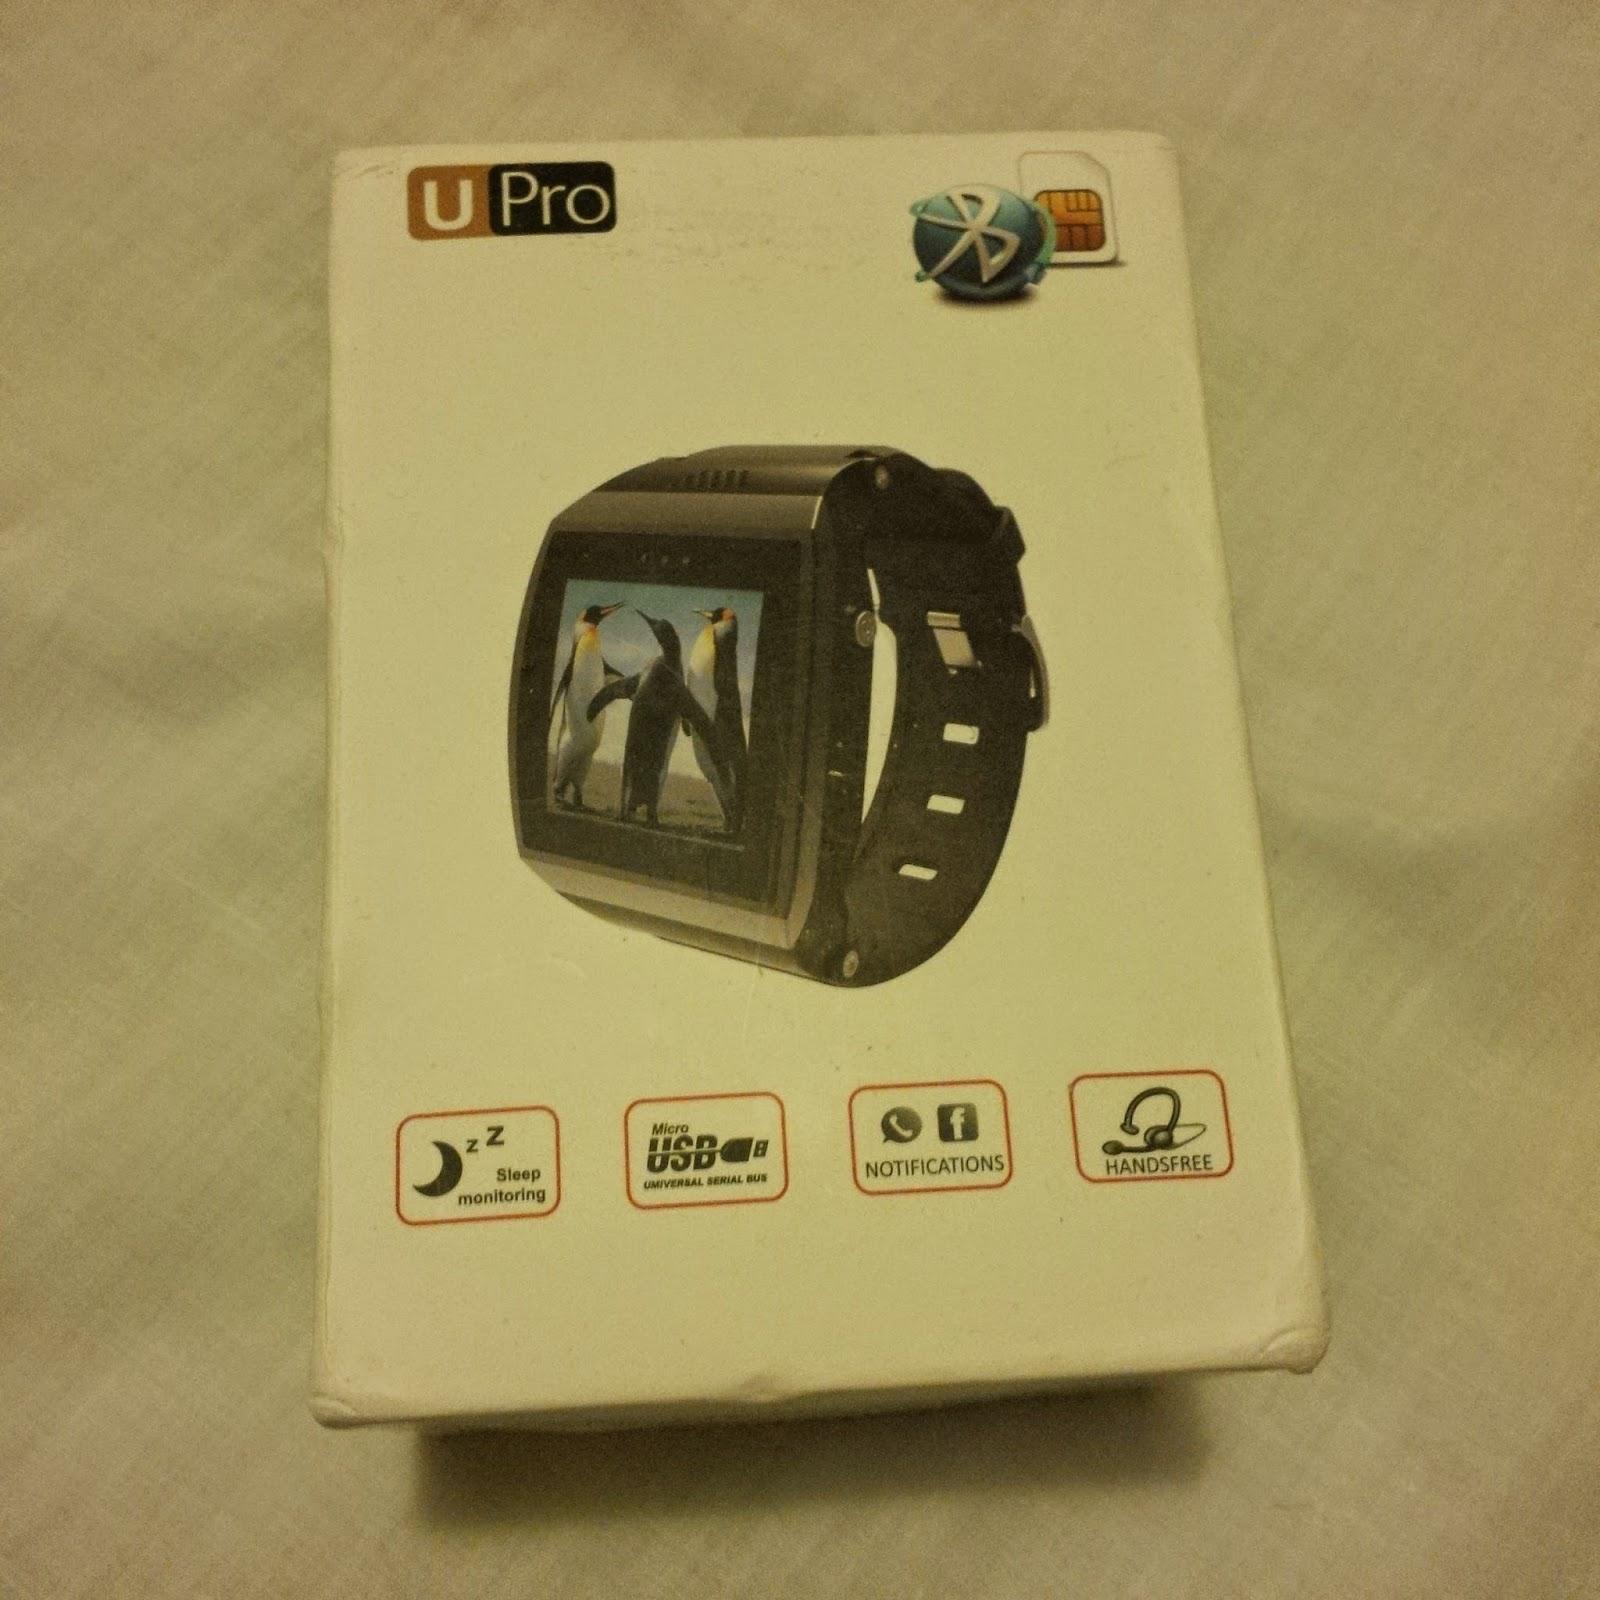 My Tech Blog: U8 Pro (U8Pro or UPro1 or U Pro1) Smartwatch